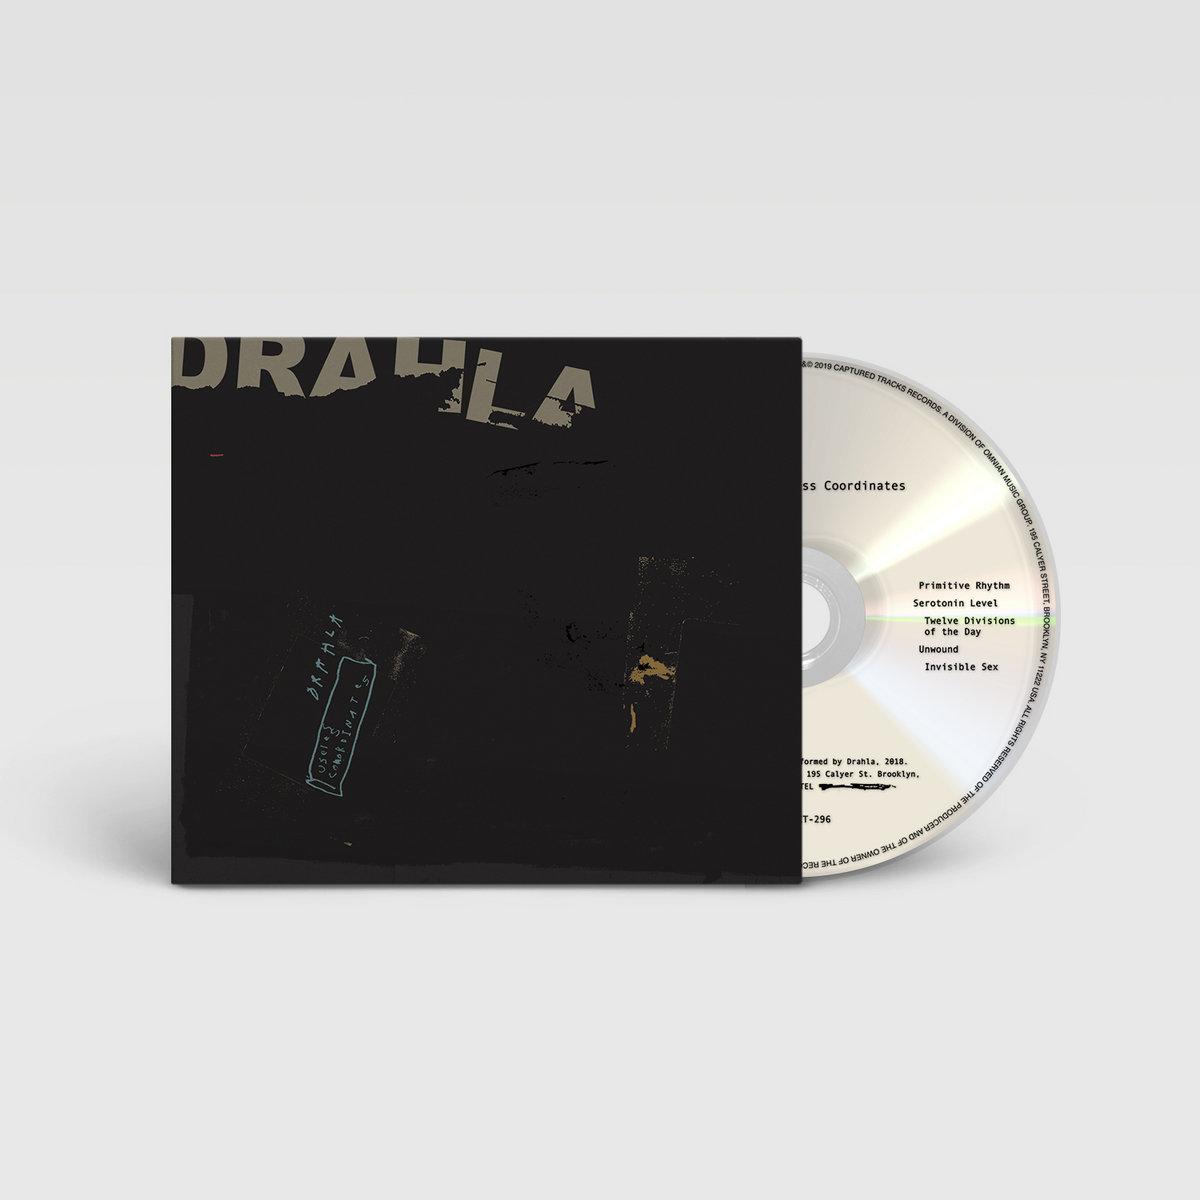 Useless Coordinates | Drahla